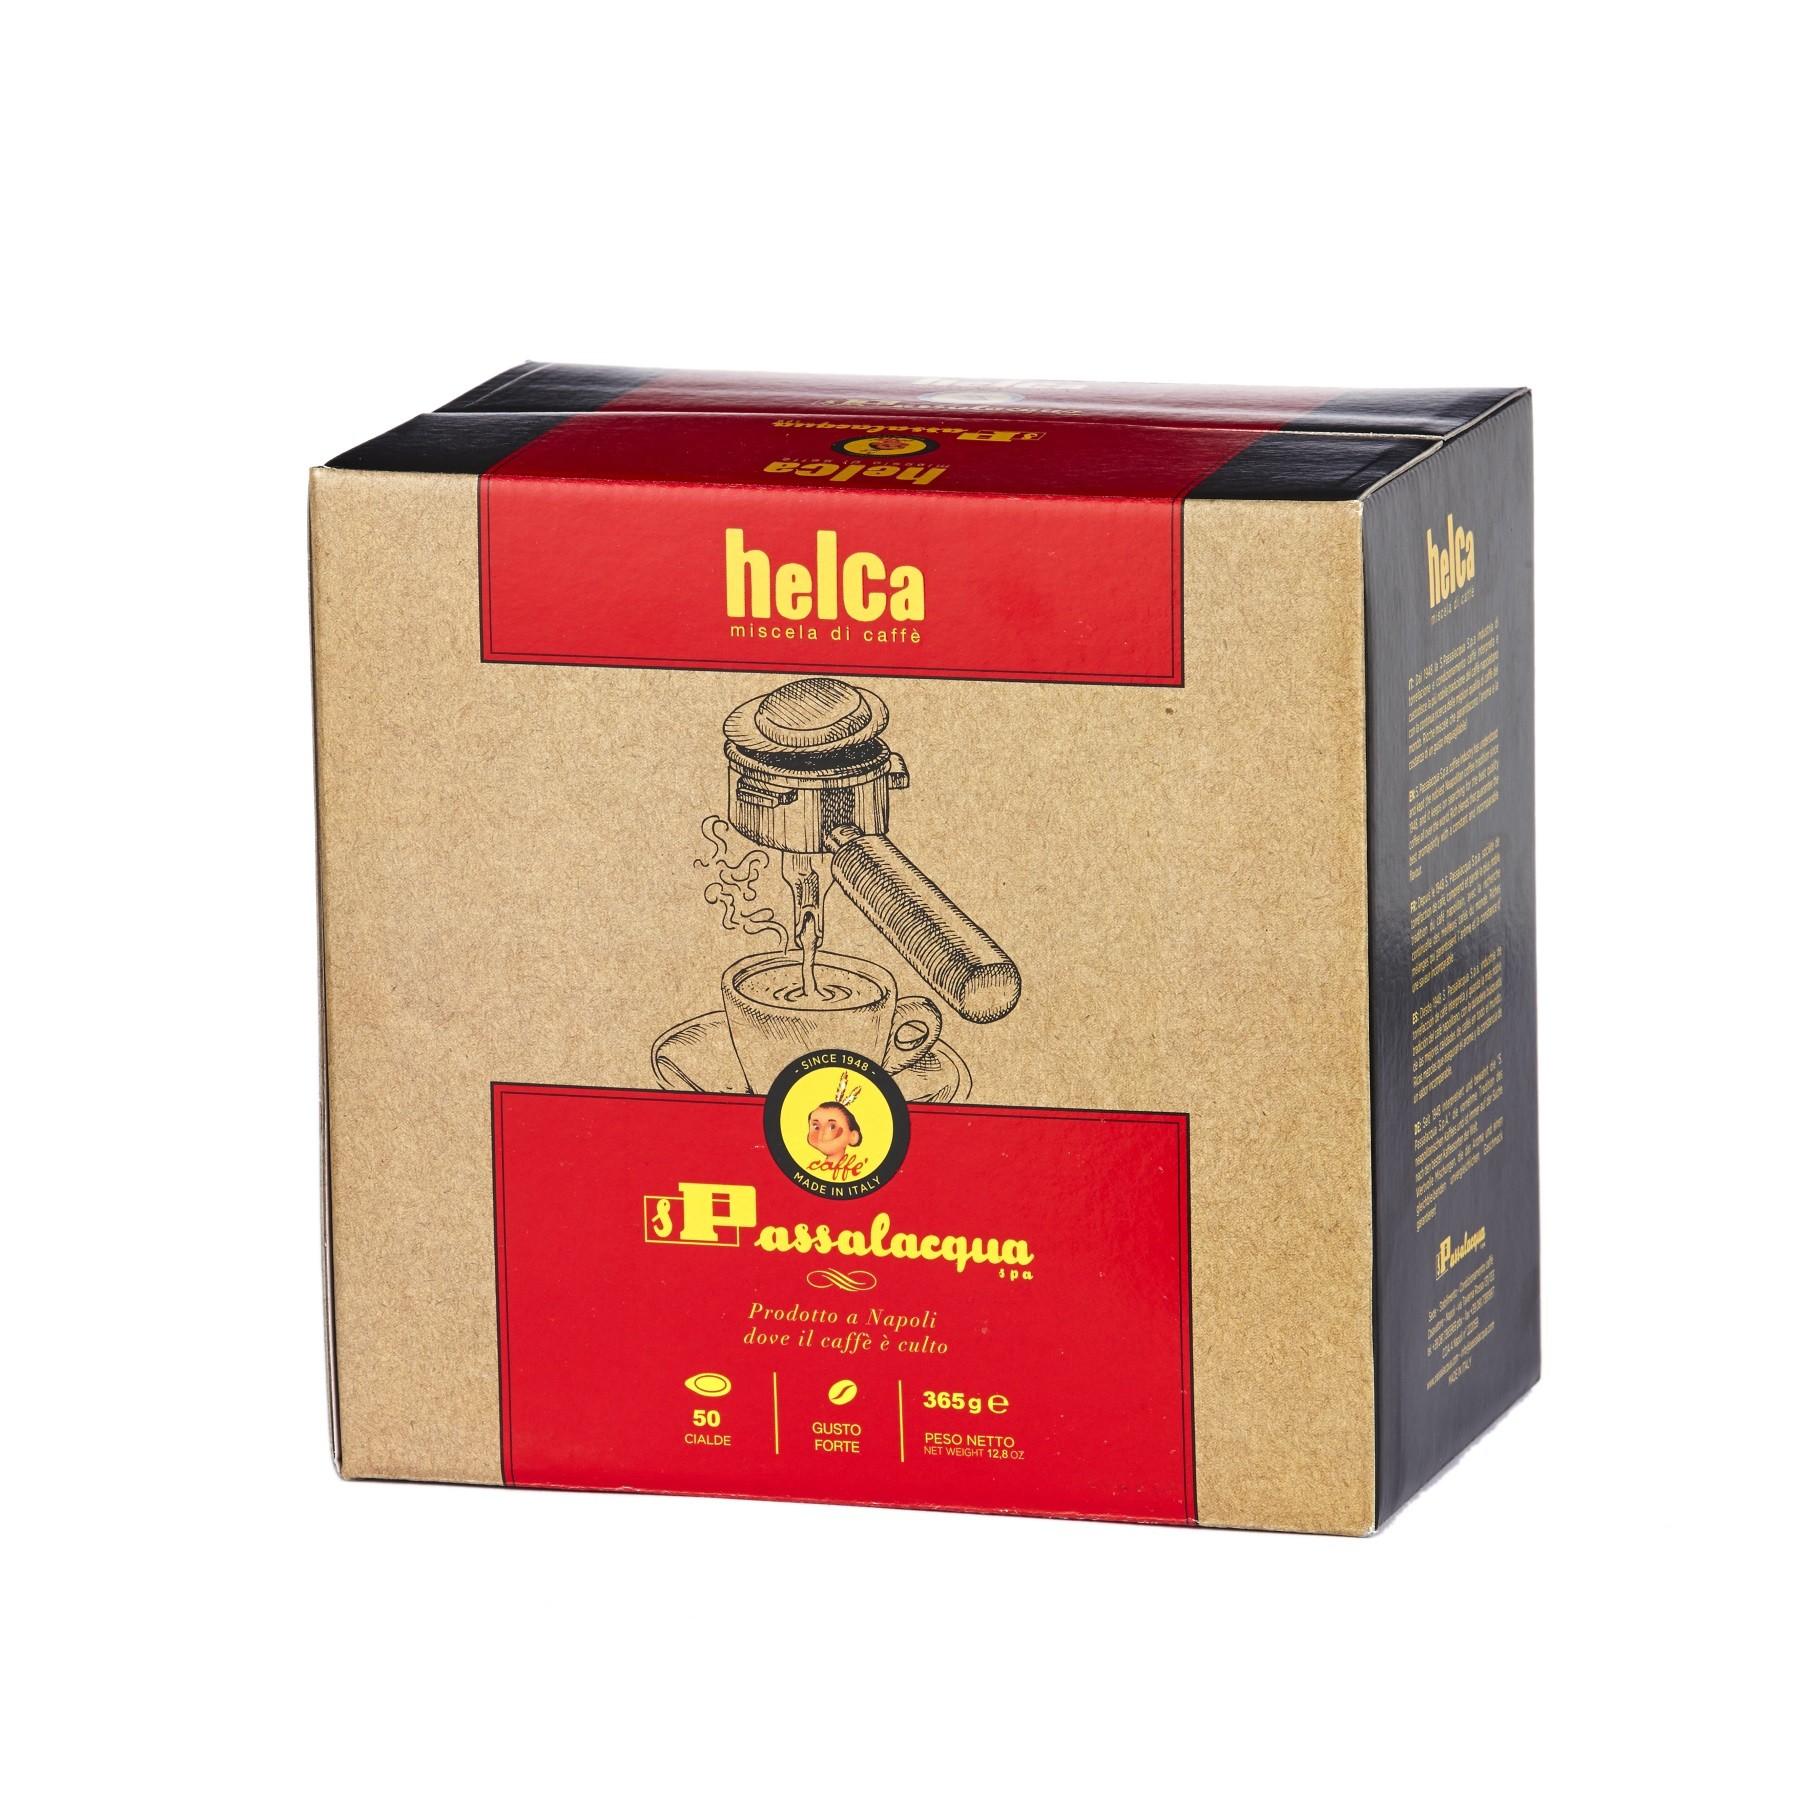 PASSALACQUA Helca 4x 50 ESE-Pads je 7,3 g gemahlen